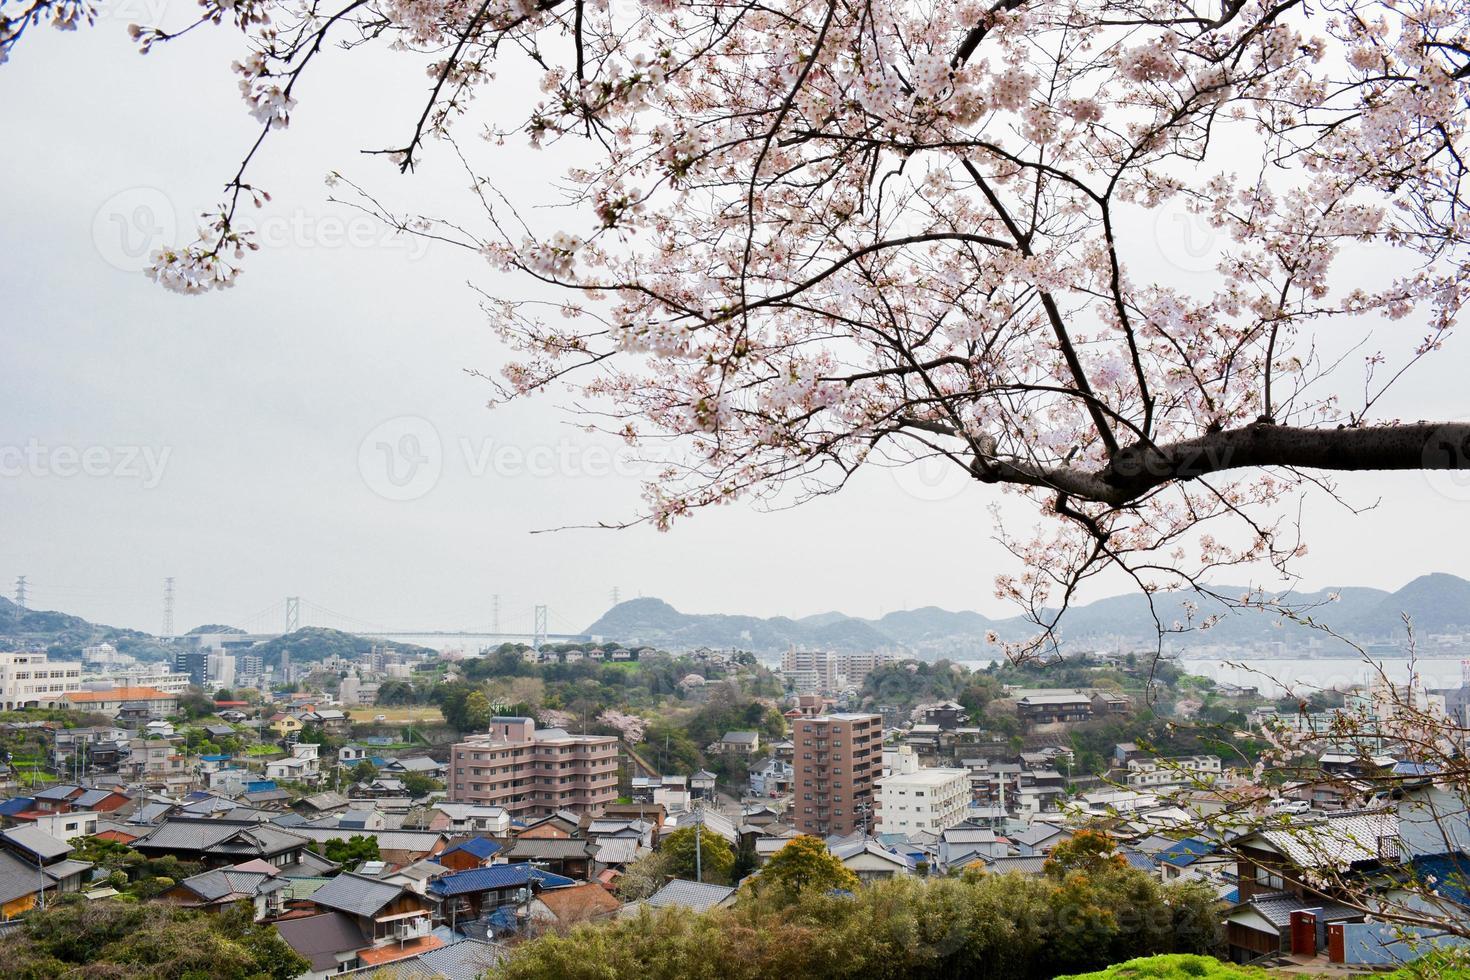 sakura och shimonoseki foto